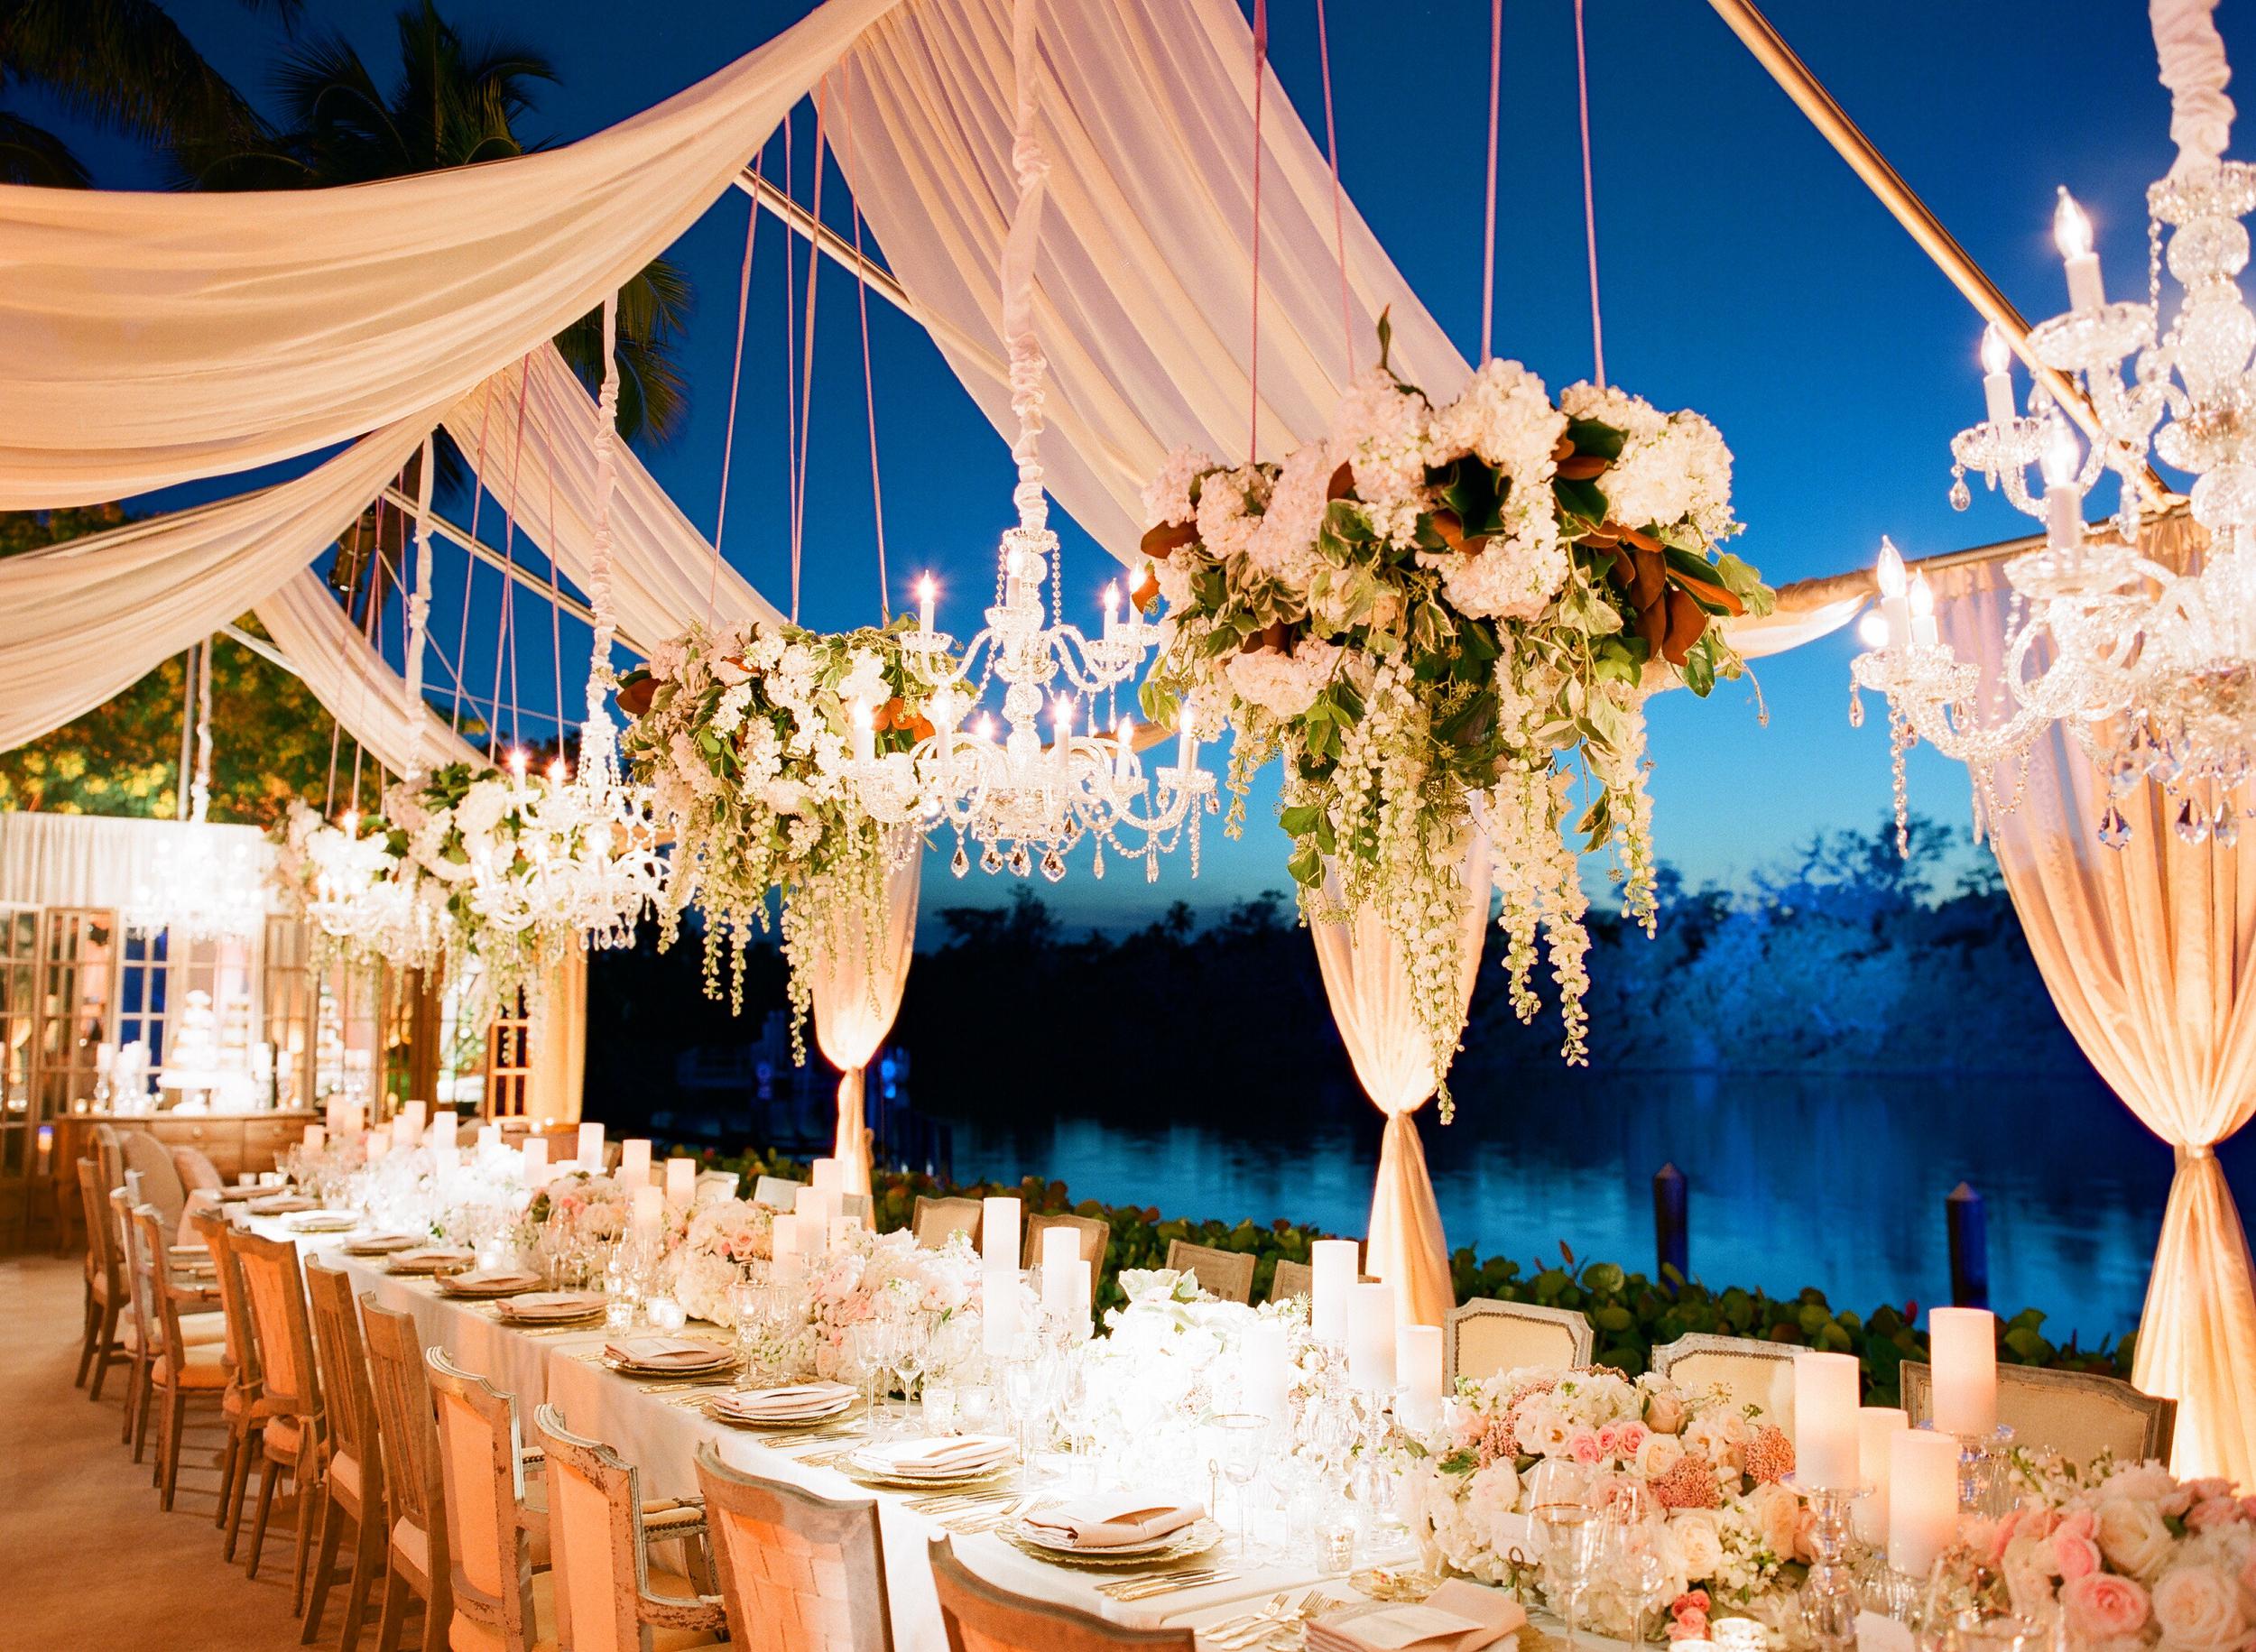 Ceci_New_York_Florida_Wedding_Style_Bride_Watercolor_Real_Custom_Luxury_134.jpg